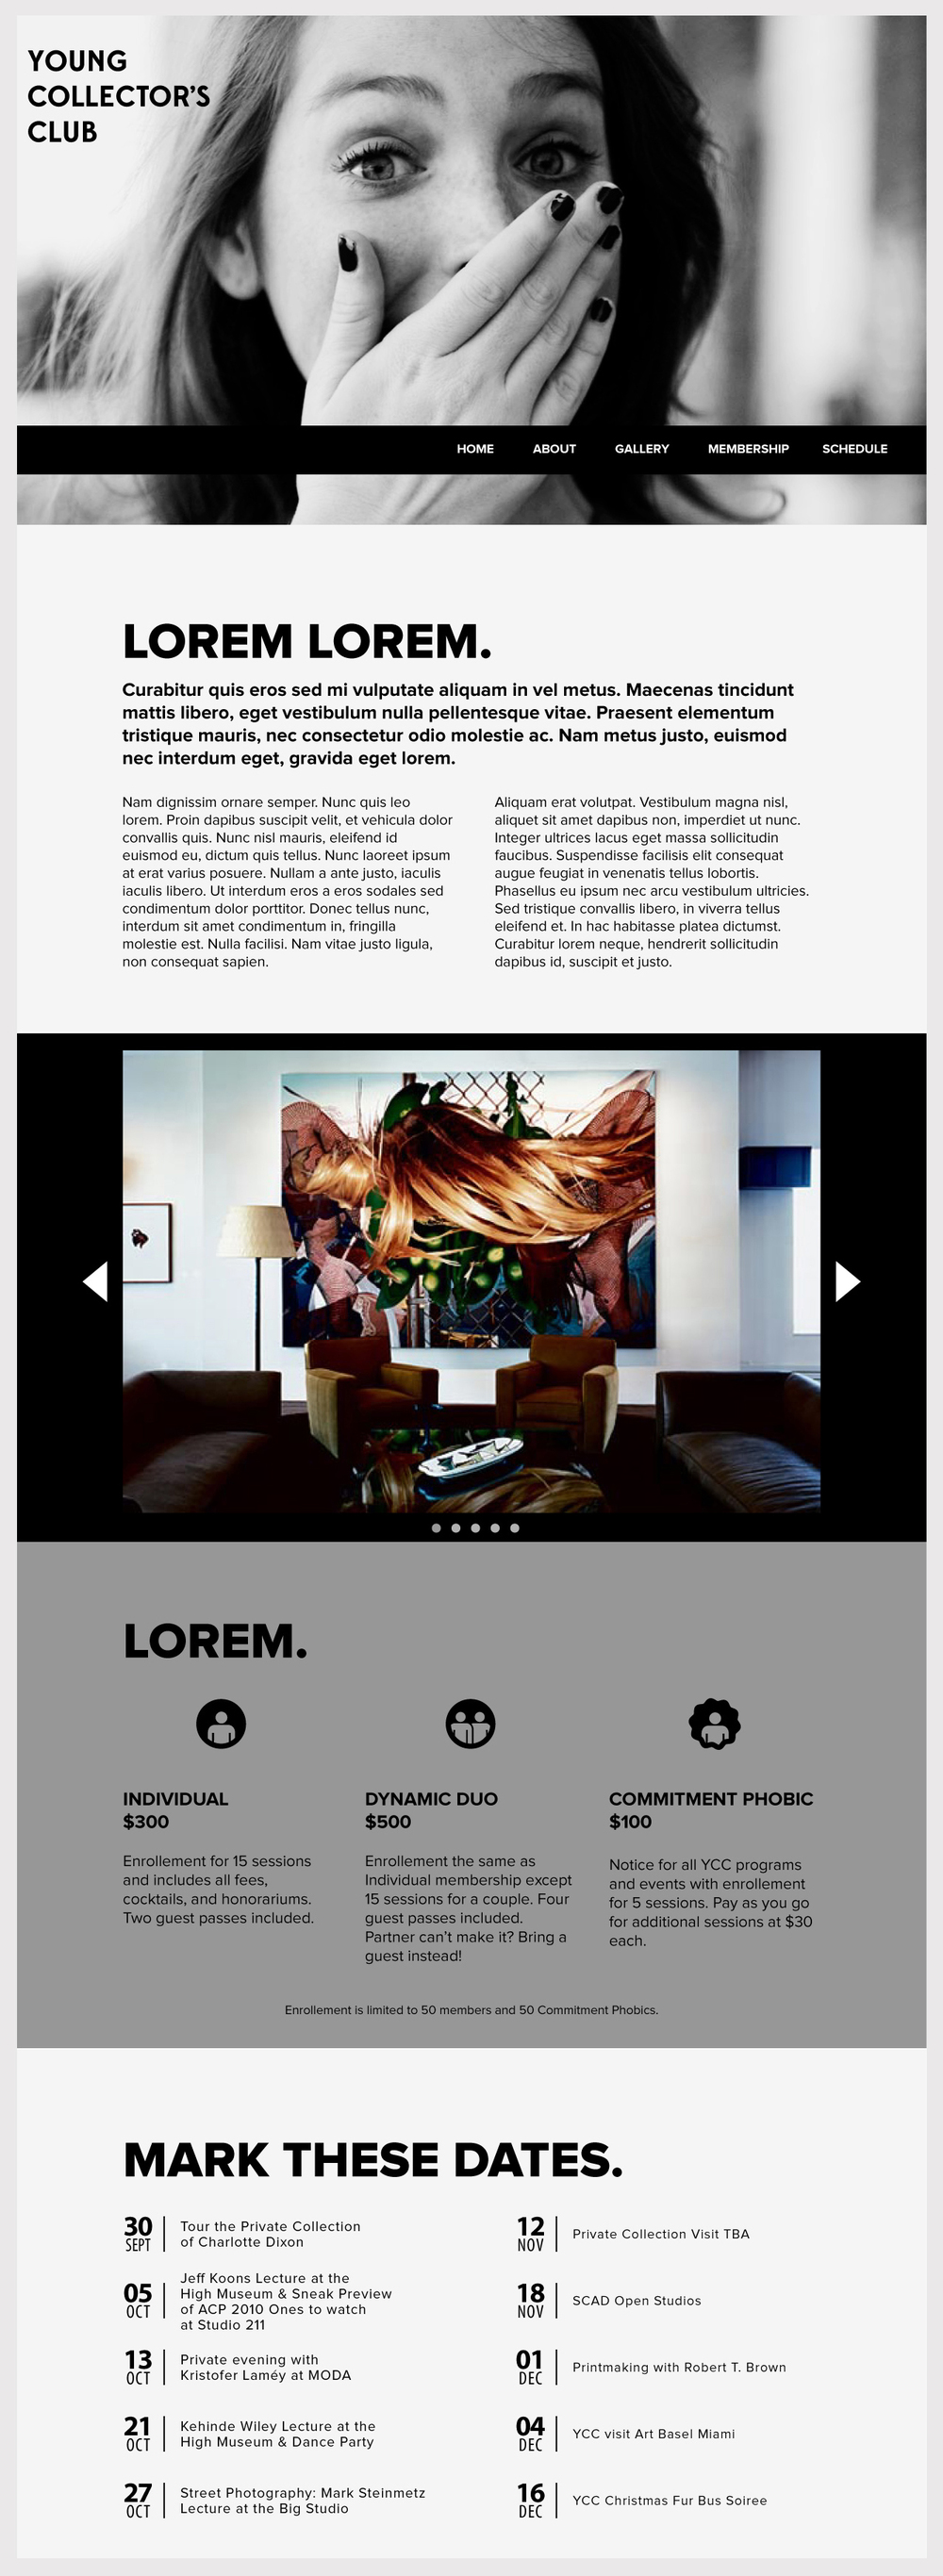 YCC_webdesign2.jpg